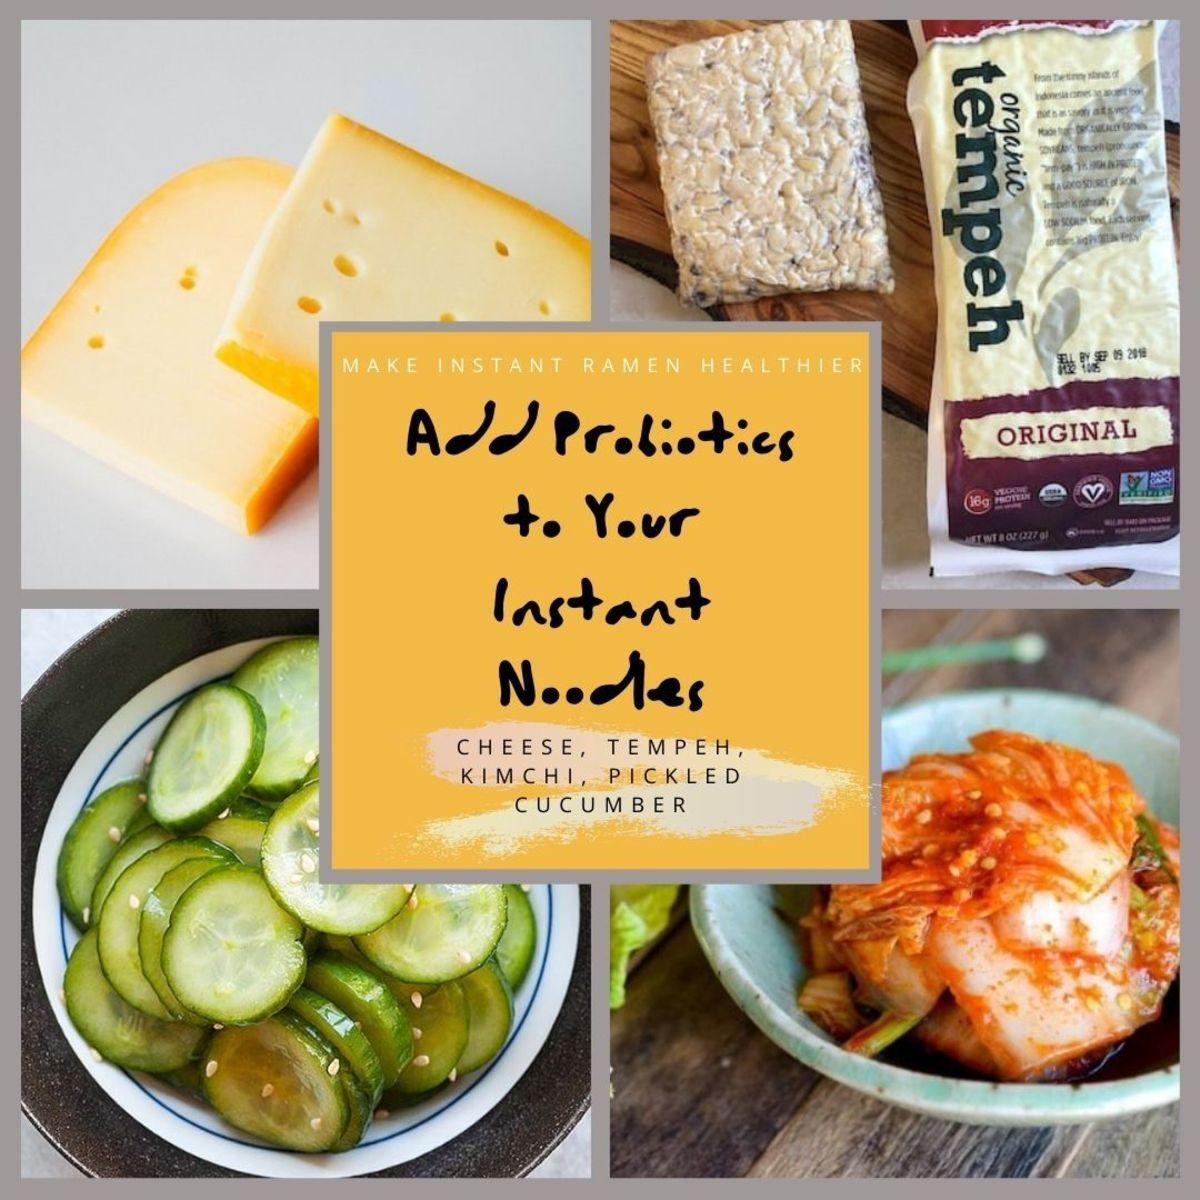 Make instant ramen better and healthier with probiotics